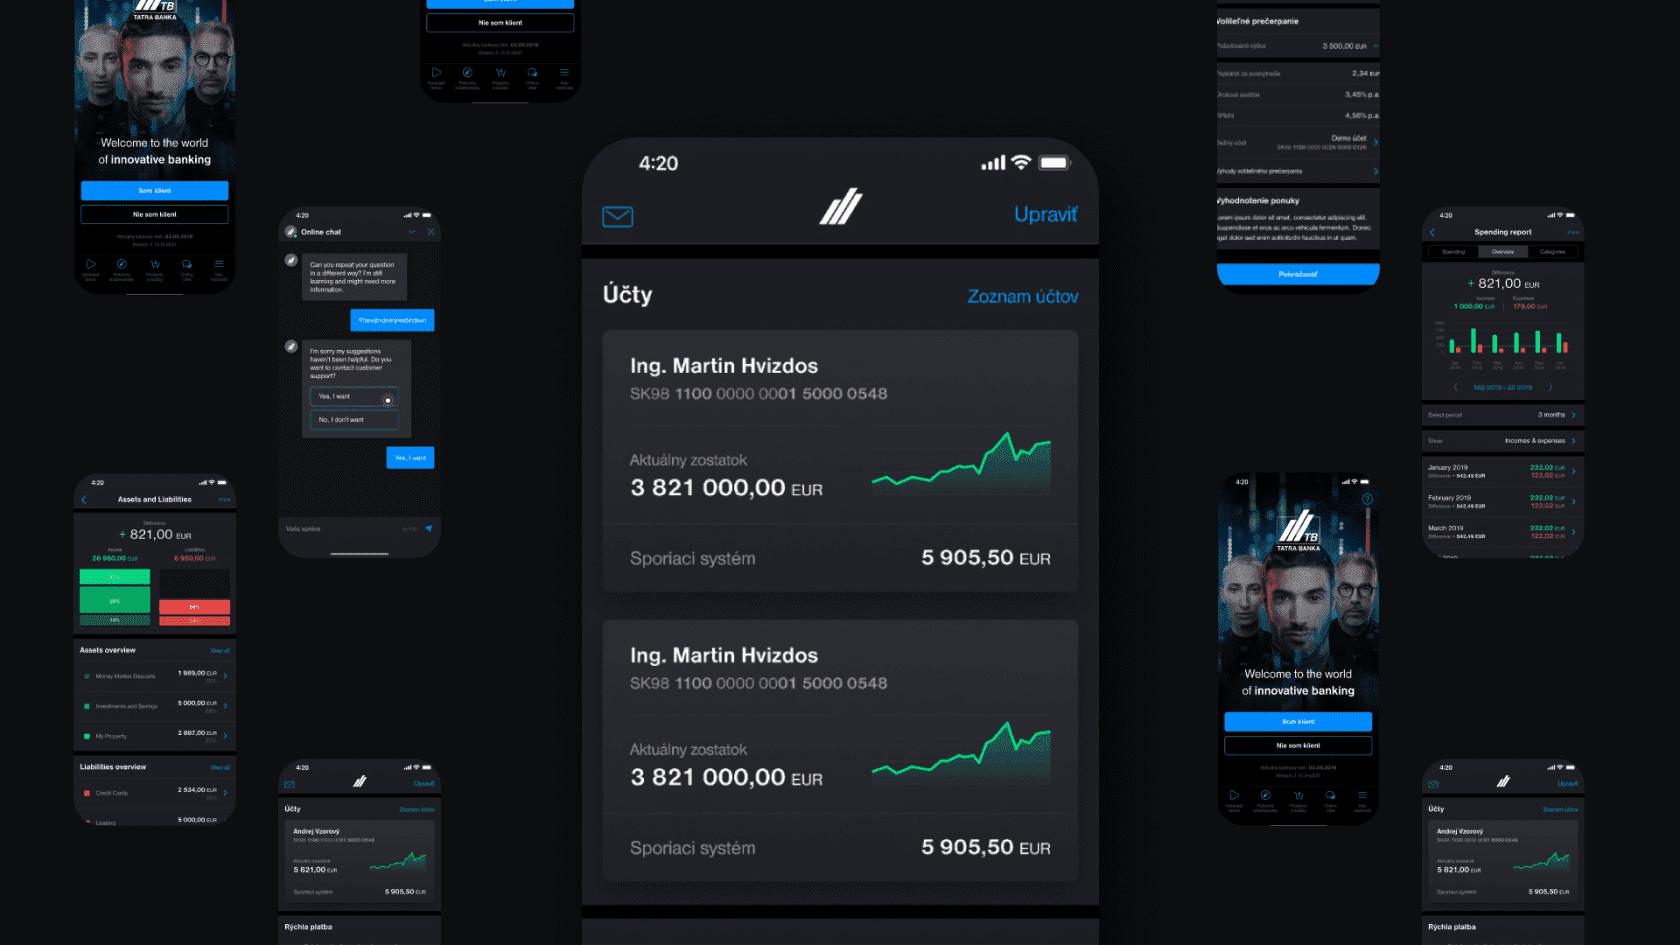 mobilna aplikacia roka v oblasti bankovnictva